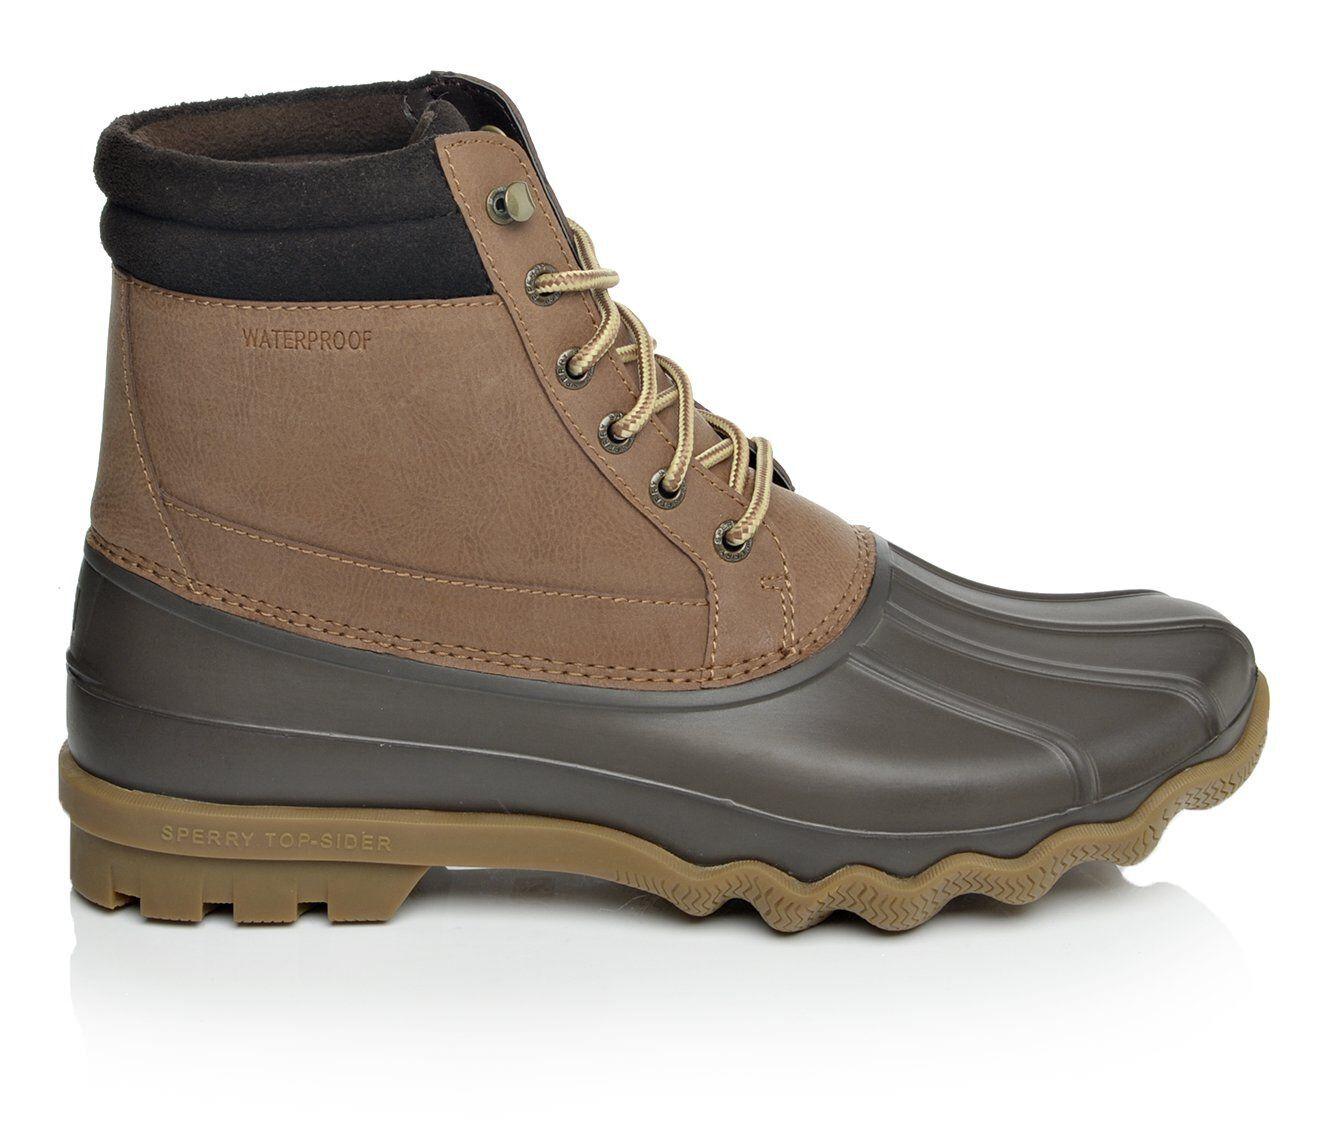 buy new style Men's Sperry Brewster Duck Boots Dark Tan